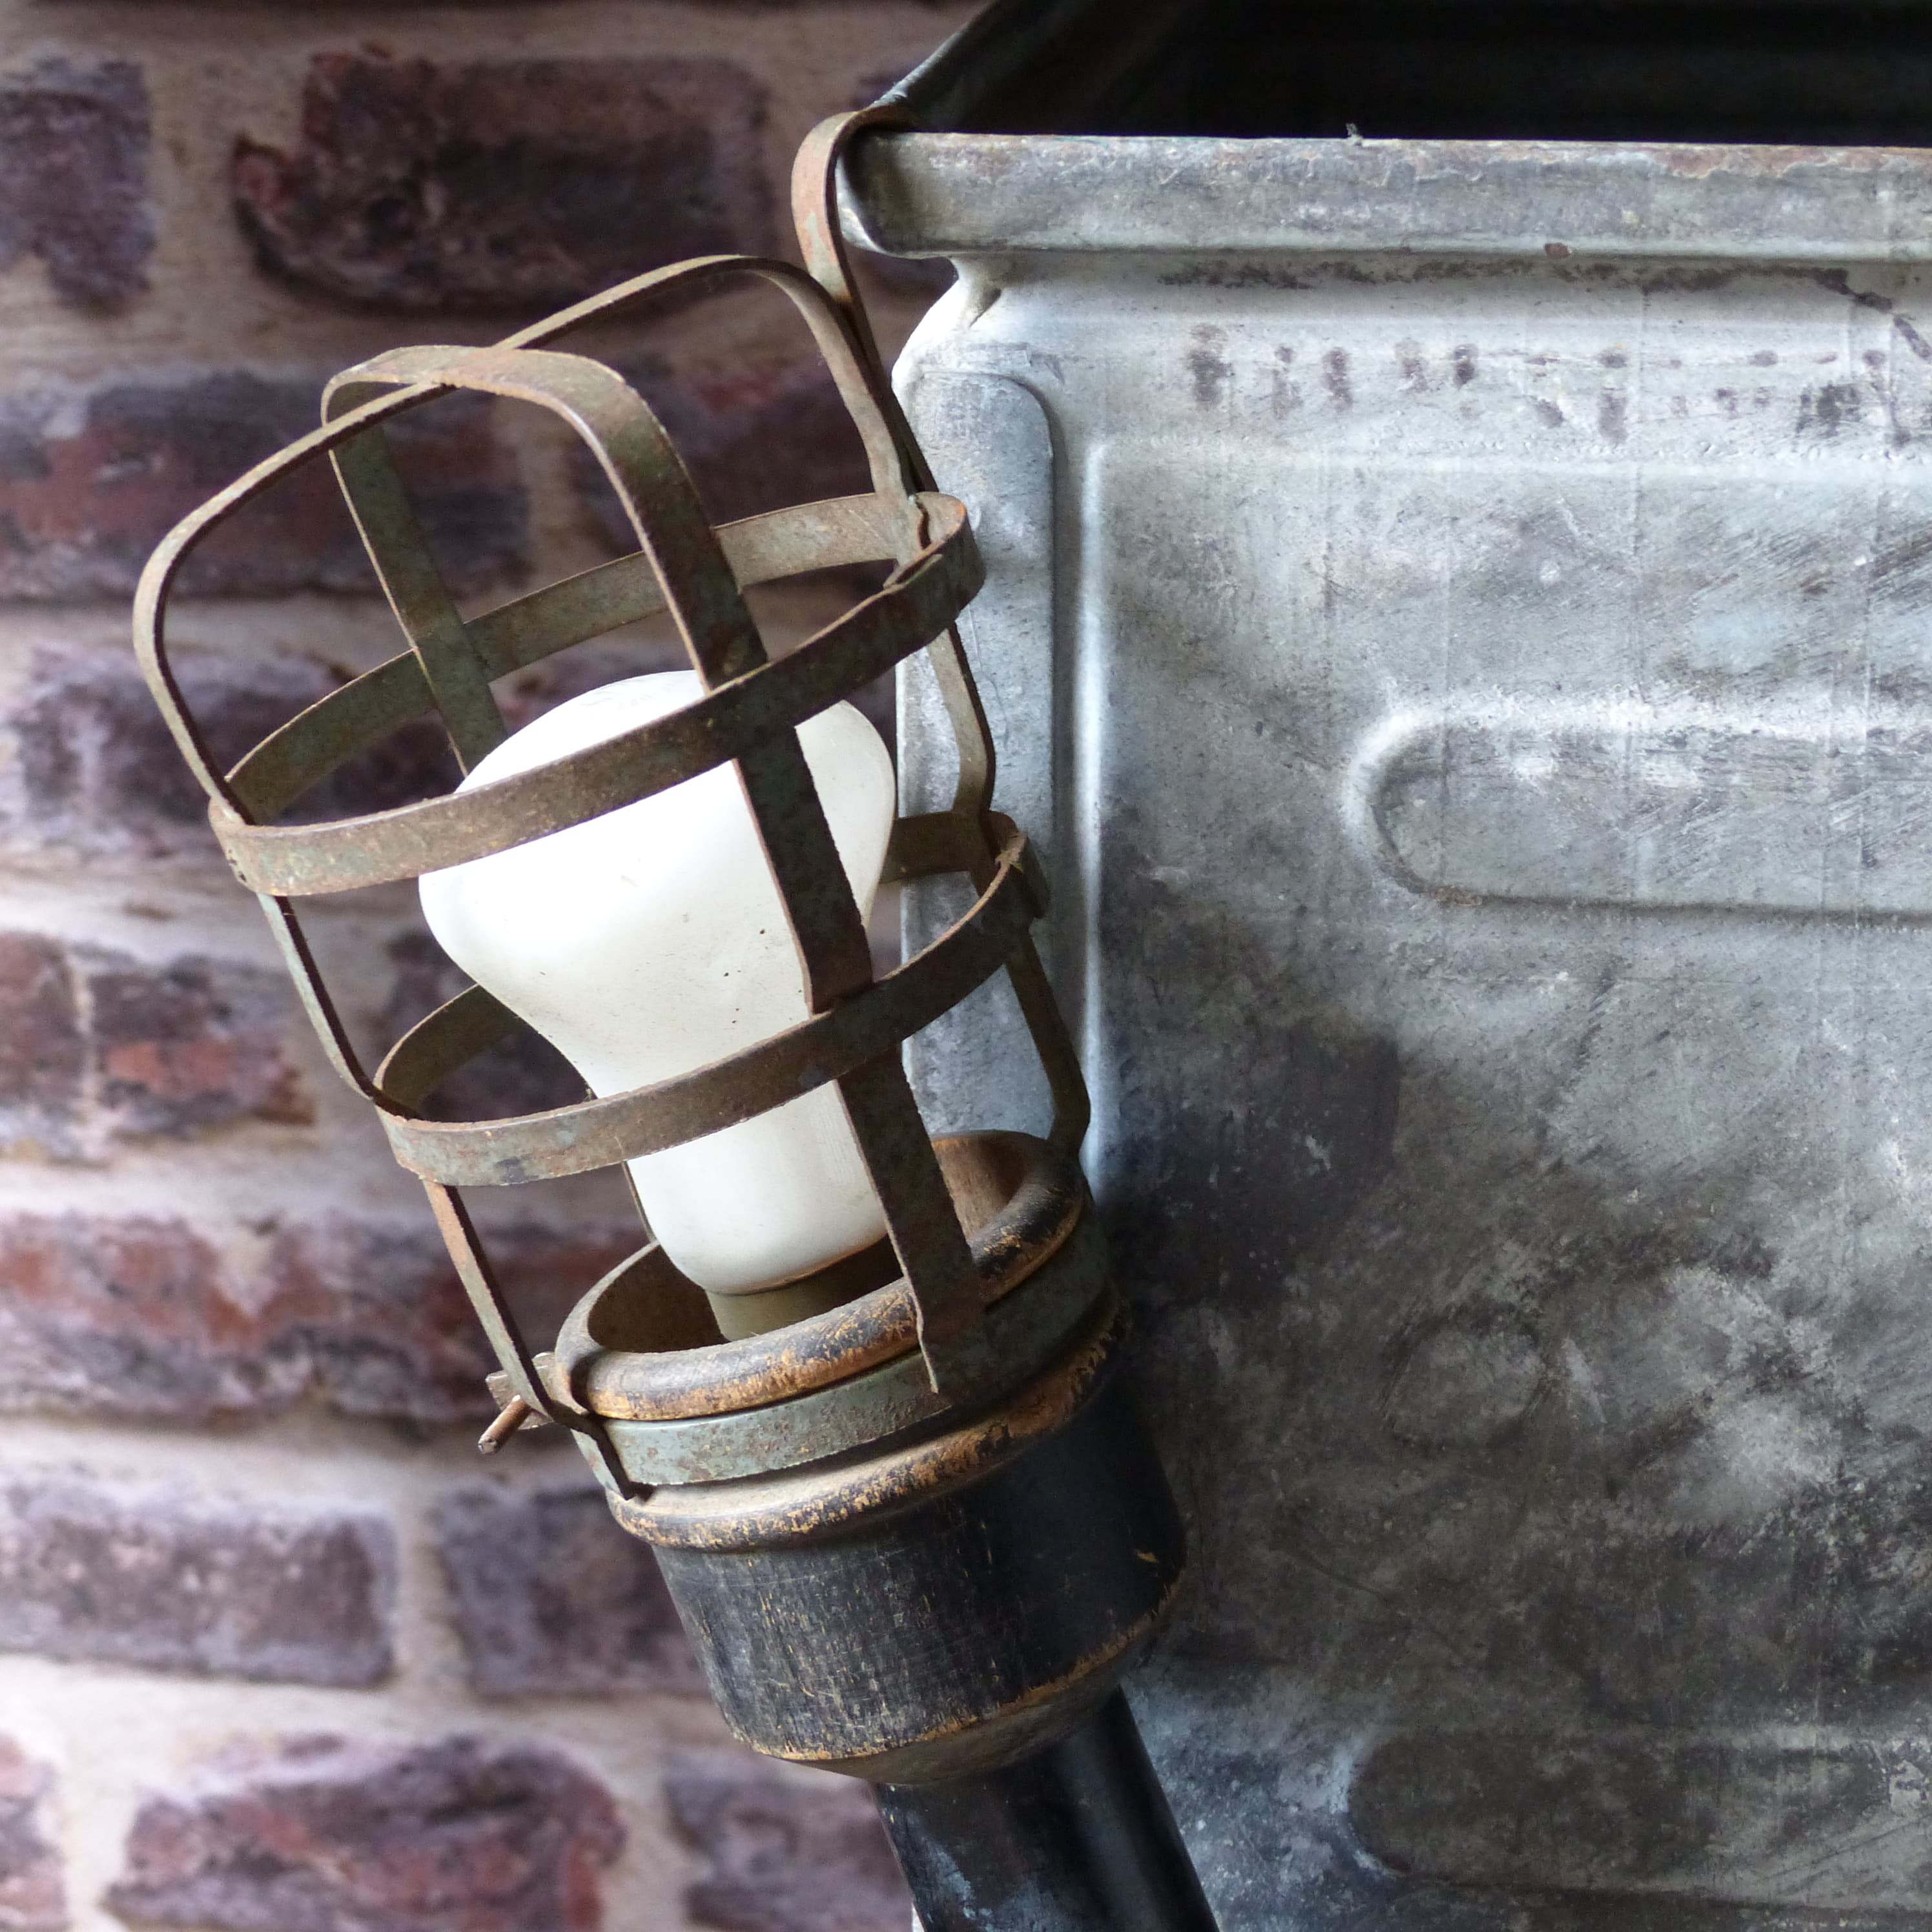 lampe baladeuse cage avec manche en bois lignedebrocante brocante en ligne chine pour vous. Black Bedroom Furniture Sets. Home Design Ideas